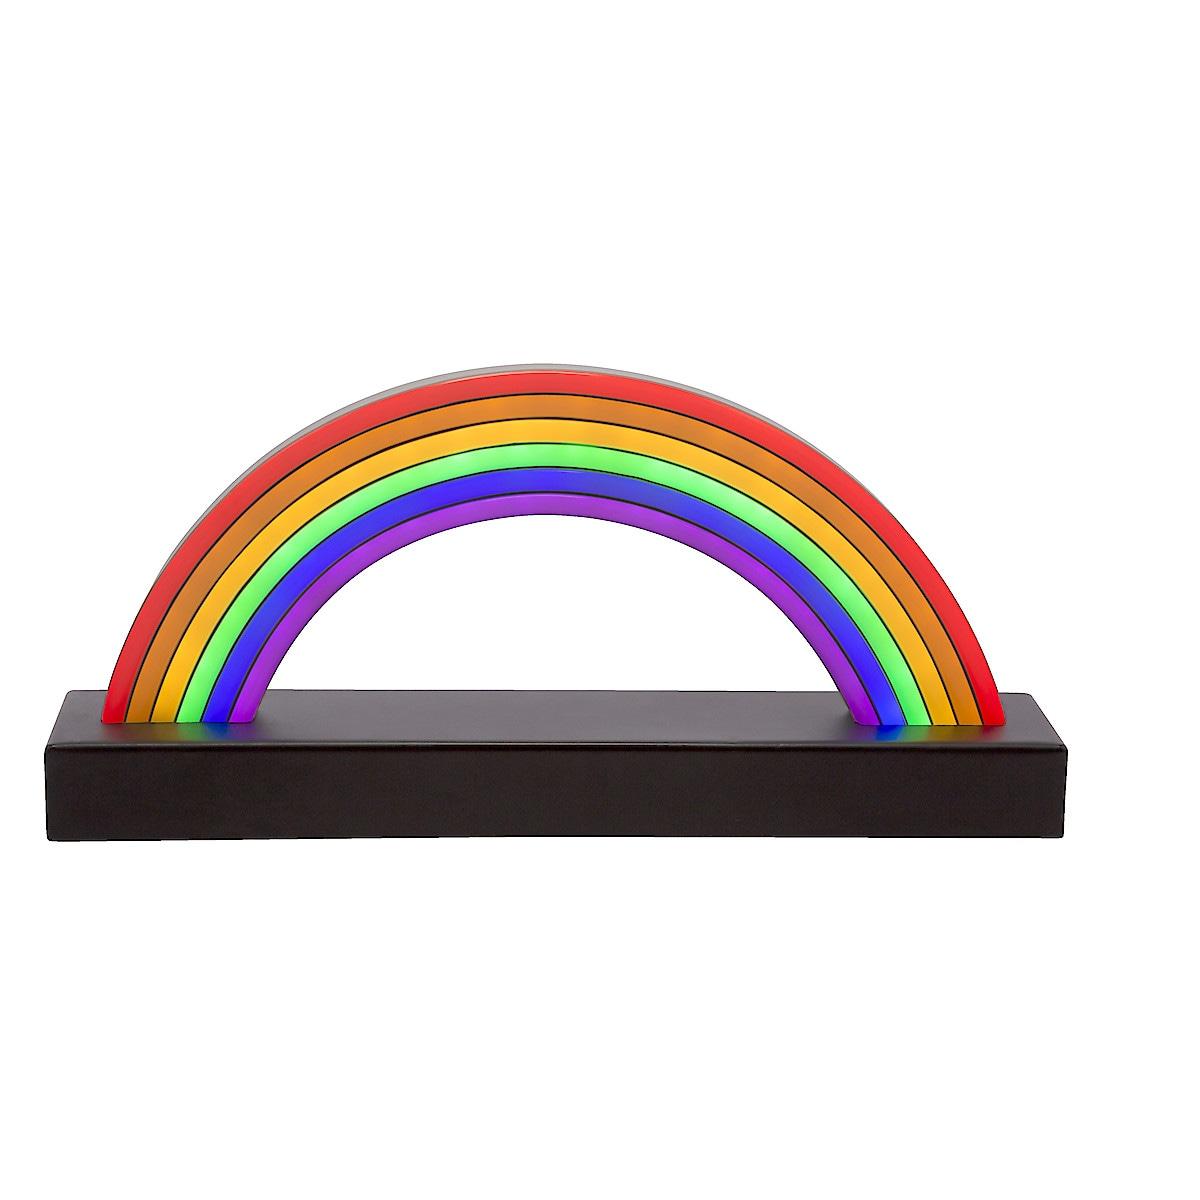 Koristevalaisin Rainbow